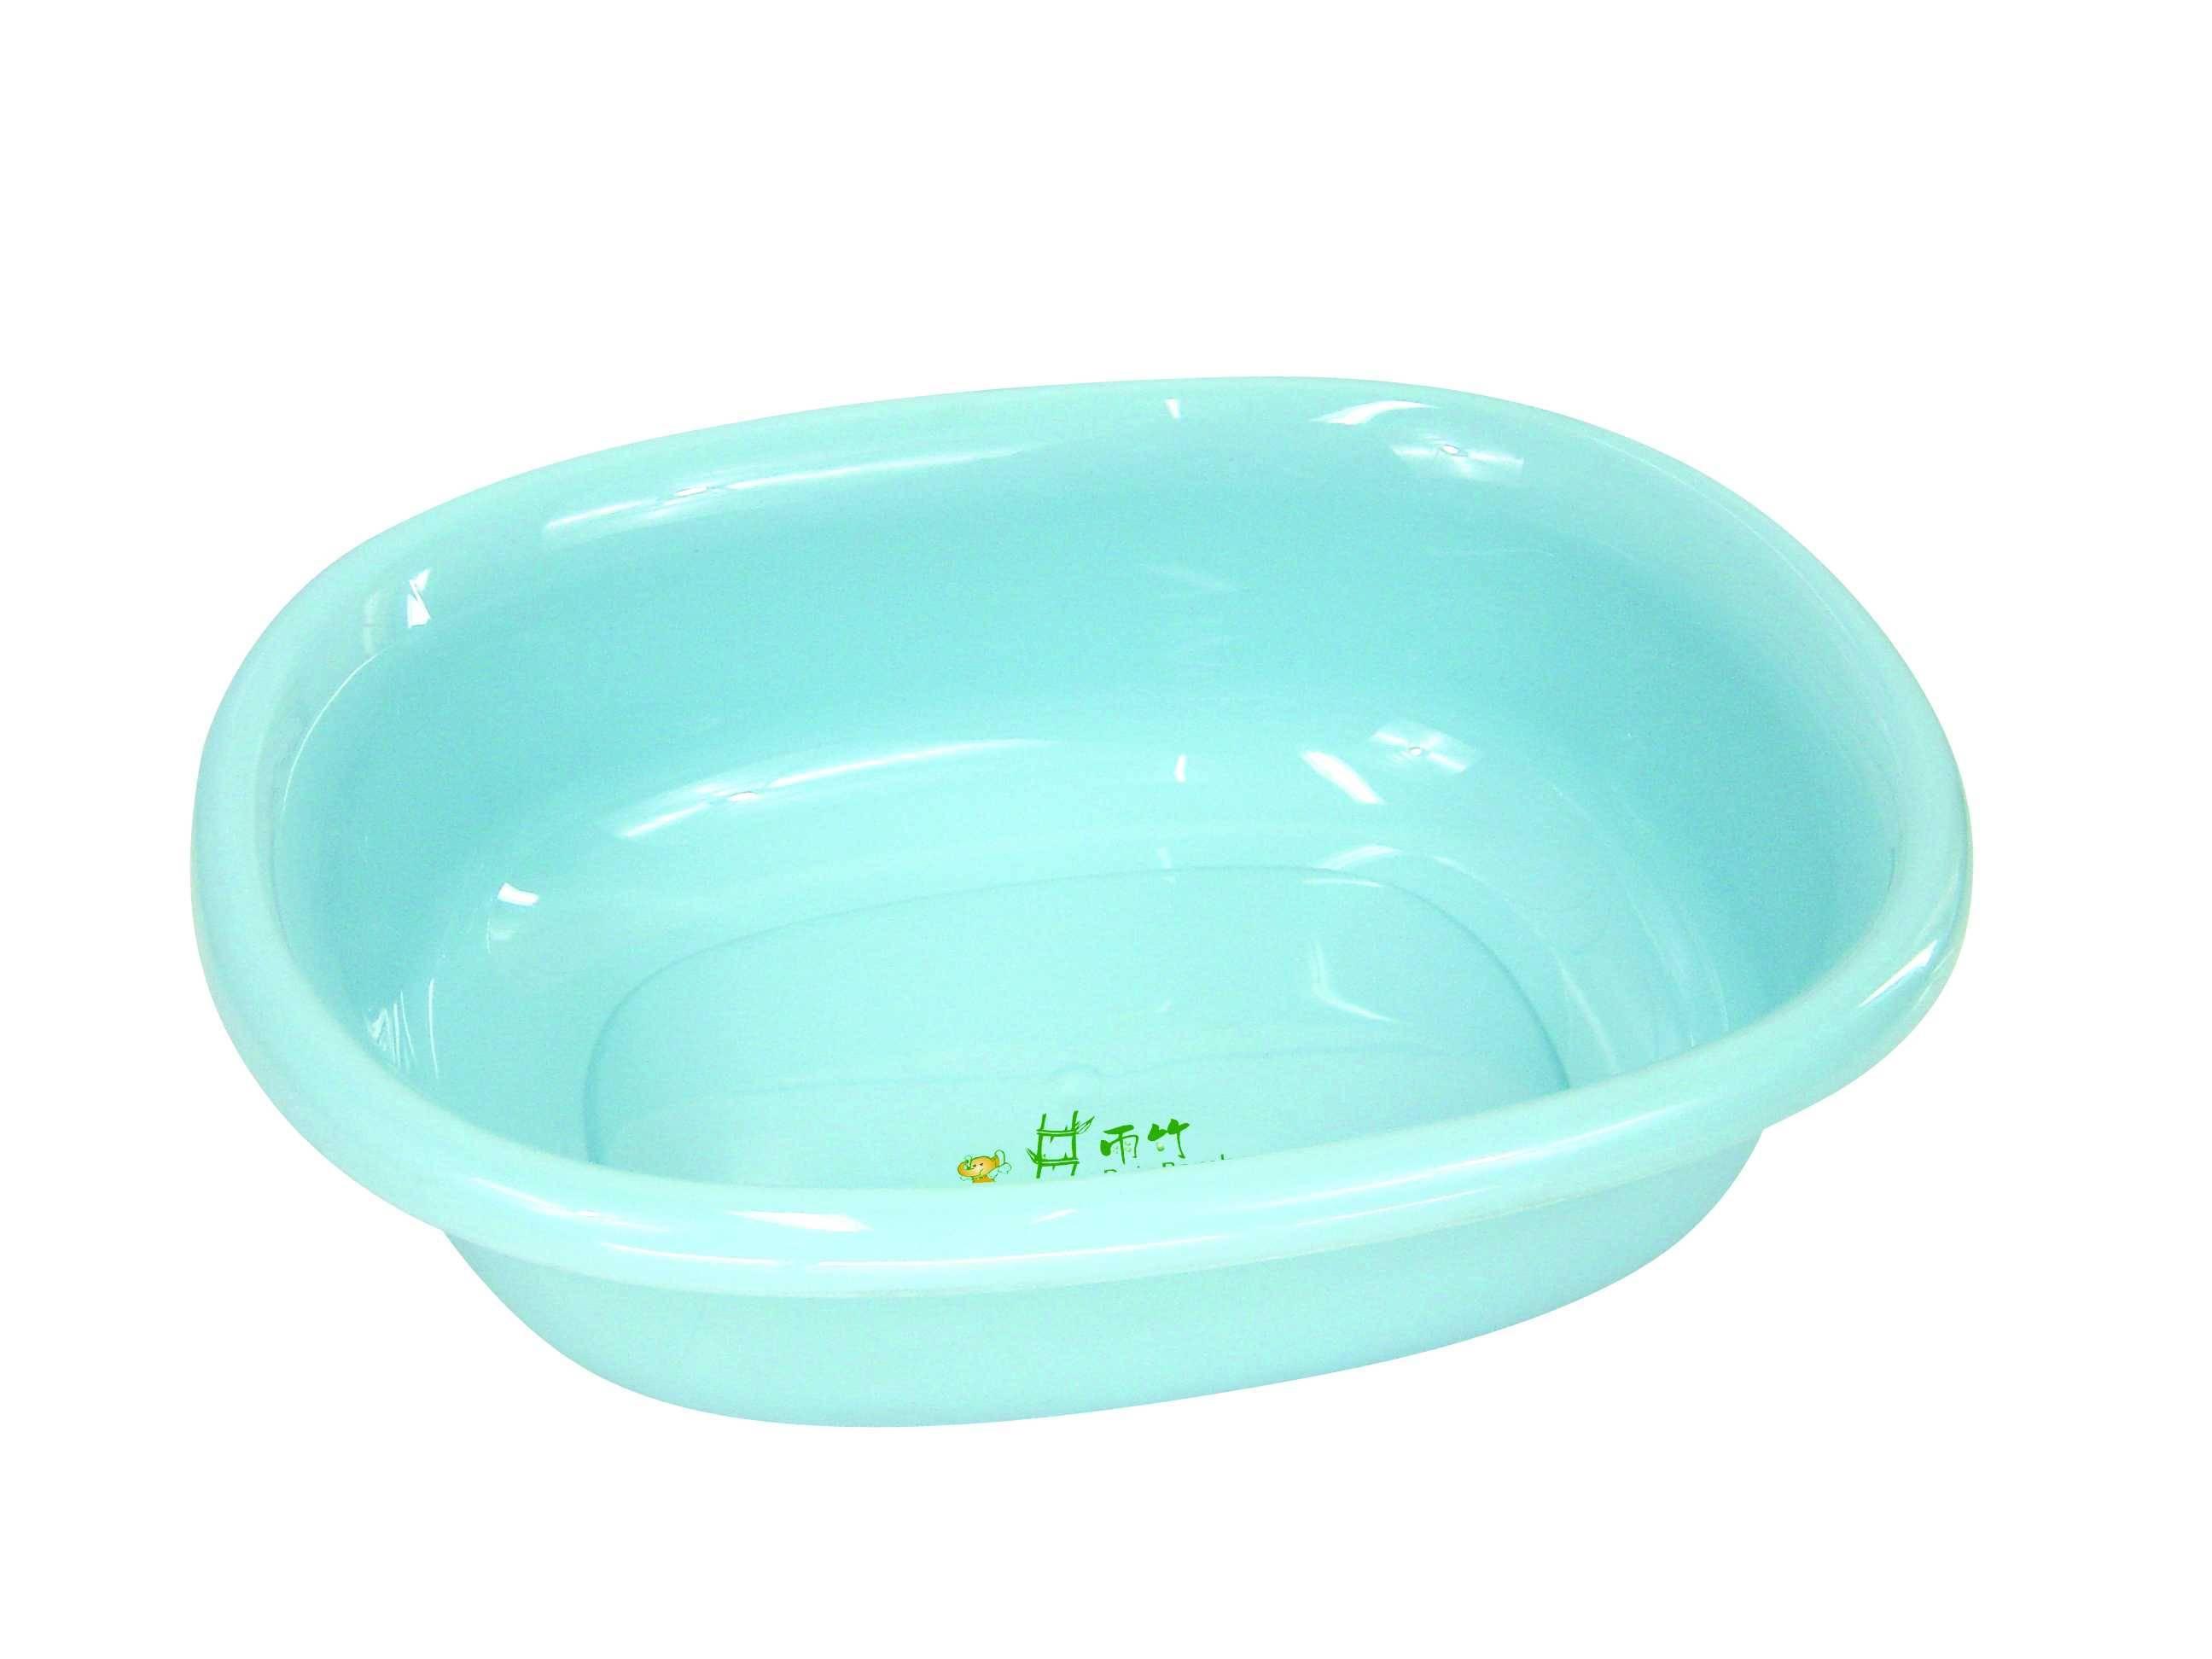 Plastic Baby Tub,Plastic Bath Tub,Piscina Manufacturer, Supplier ...